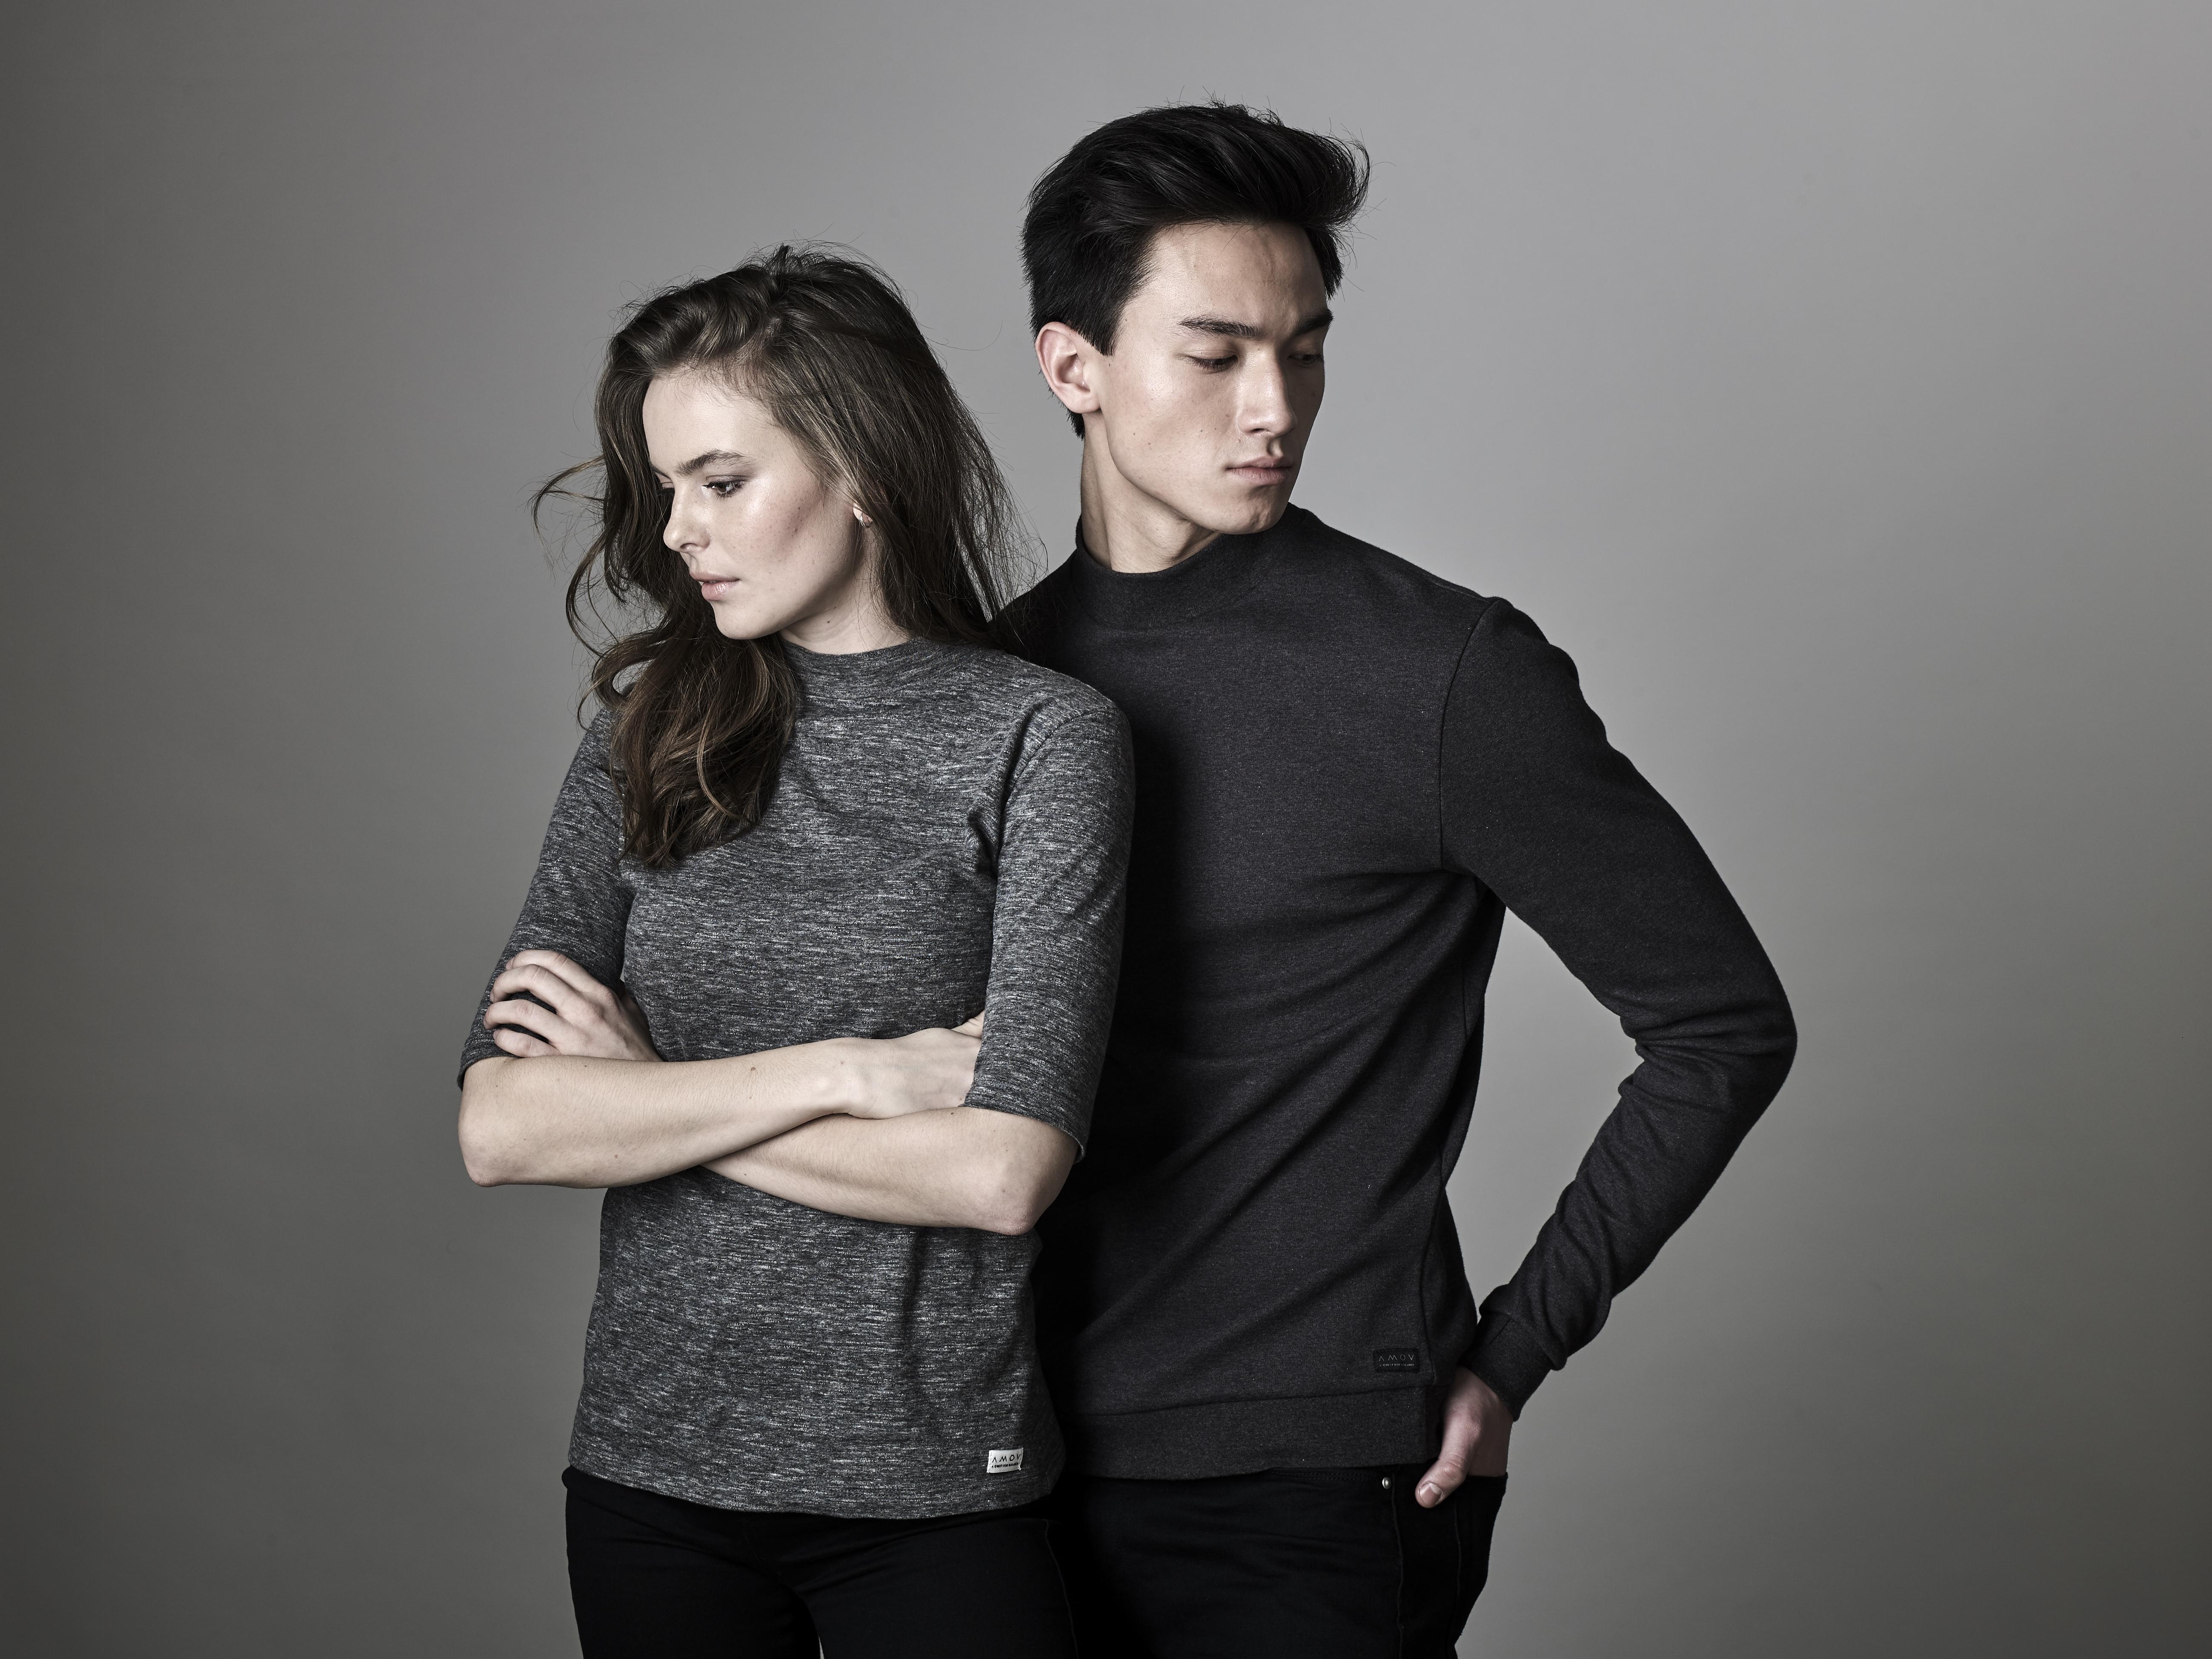 AMOV ökosoziales Fashion Unternehmen Dänemark